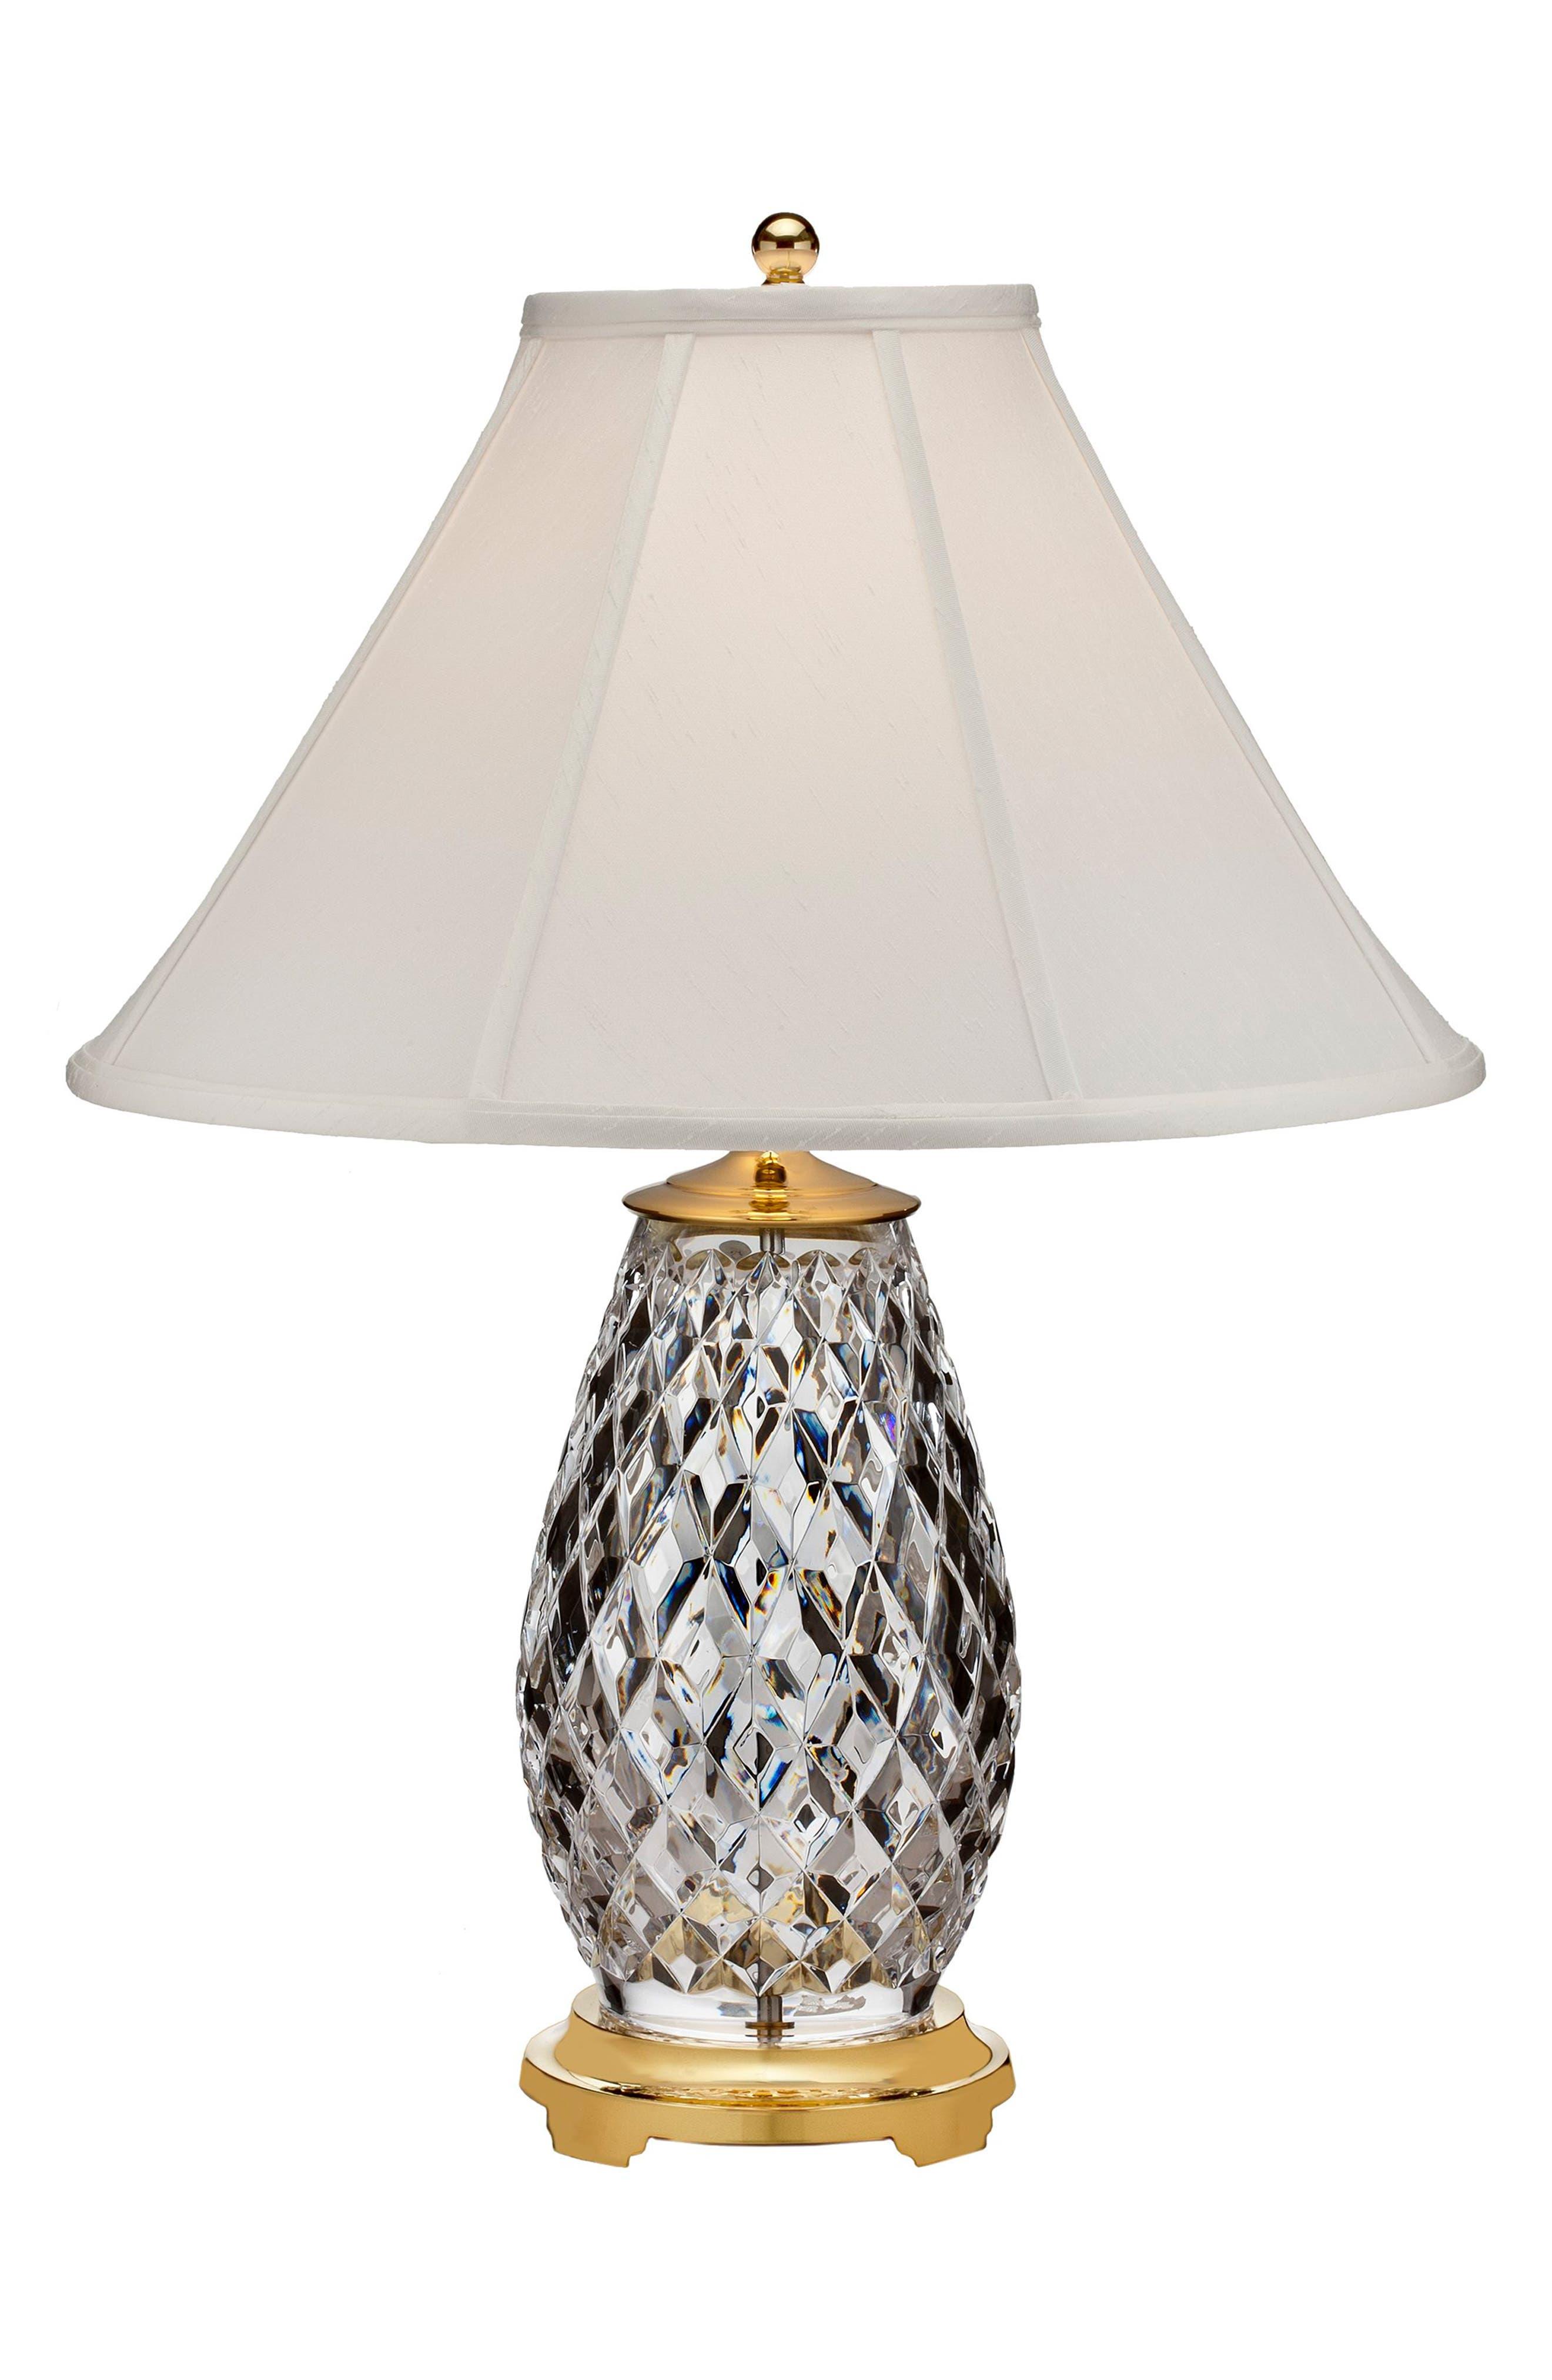 Main Image - Waterford Diama Crystal Table Lamp